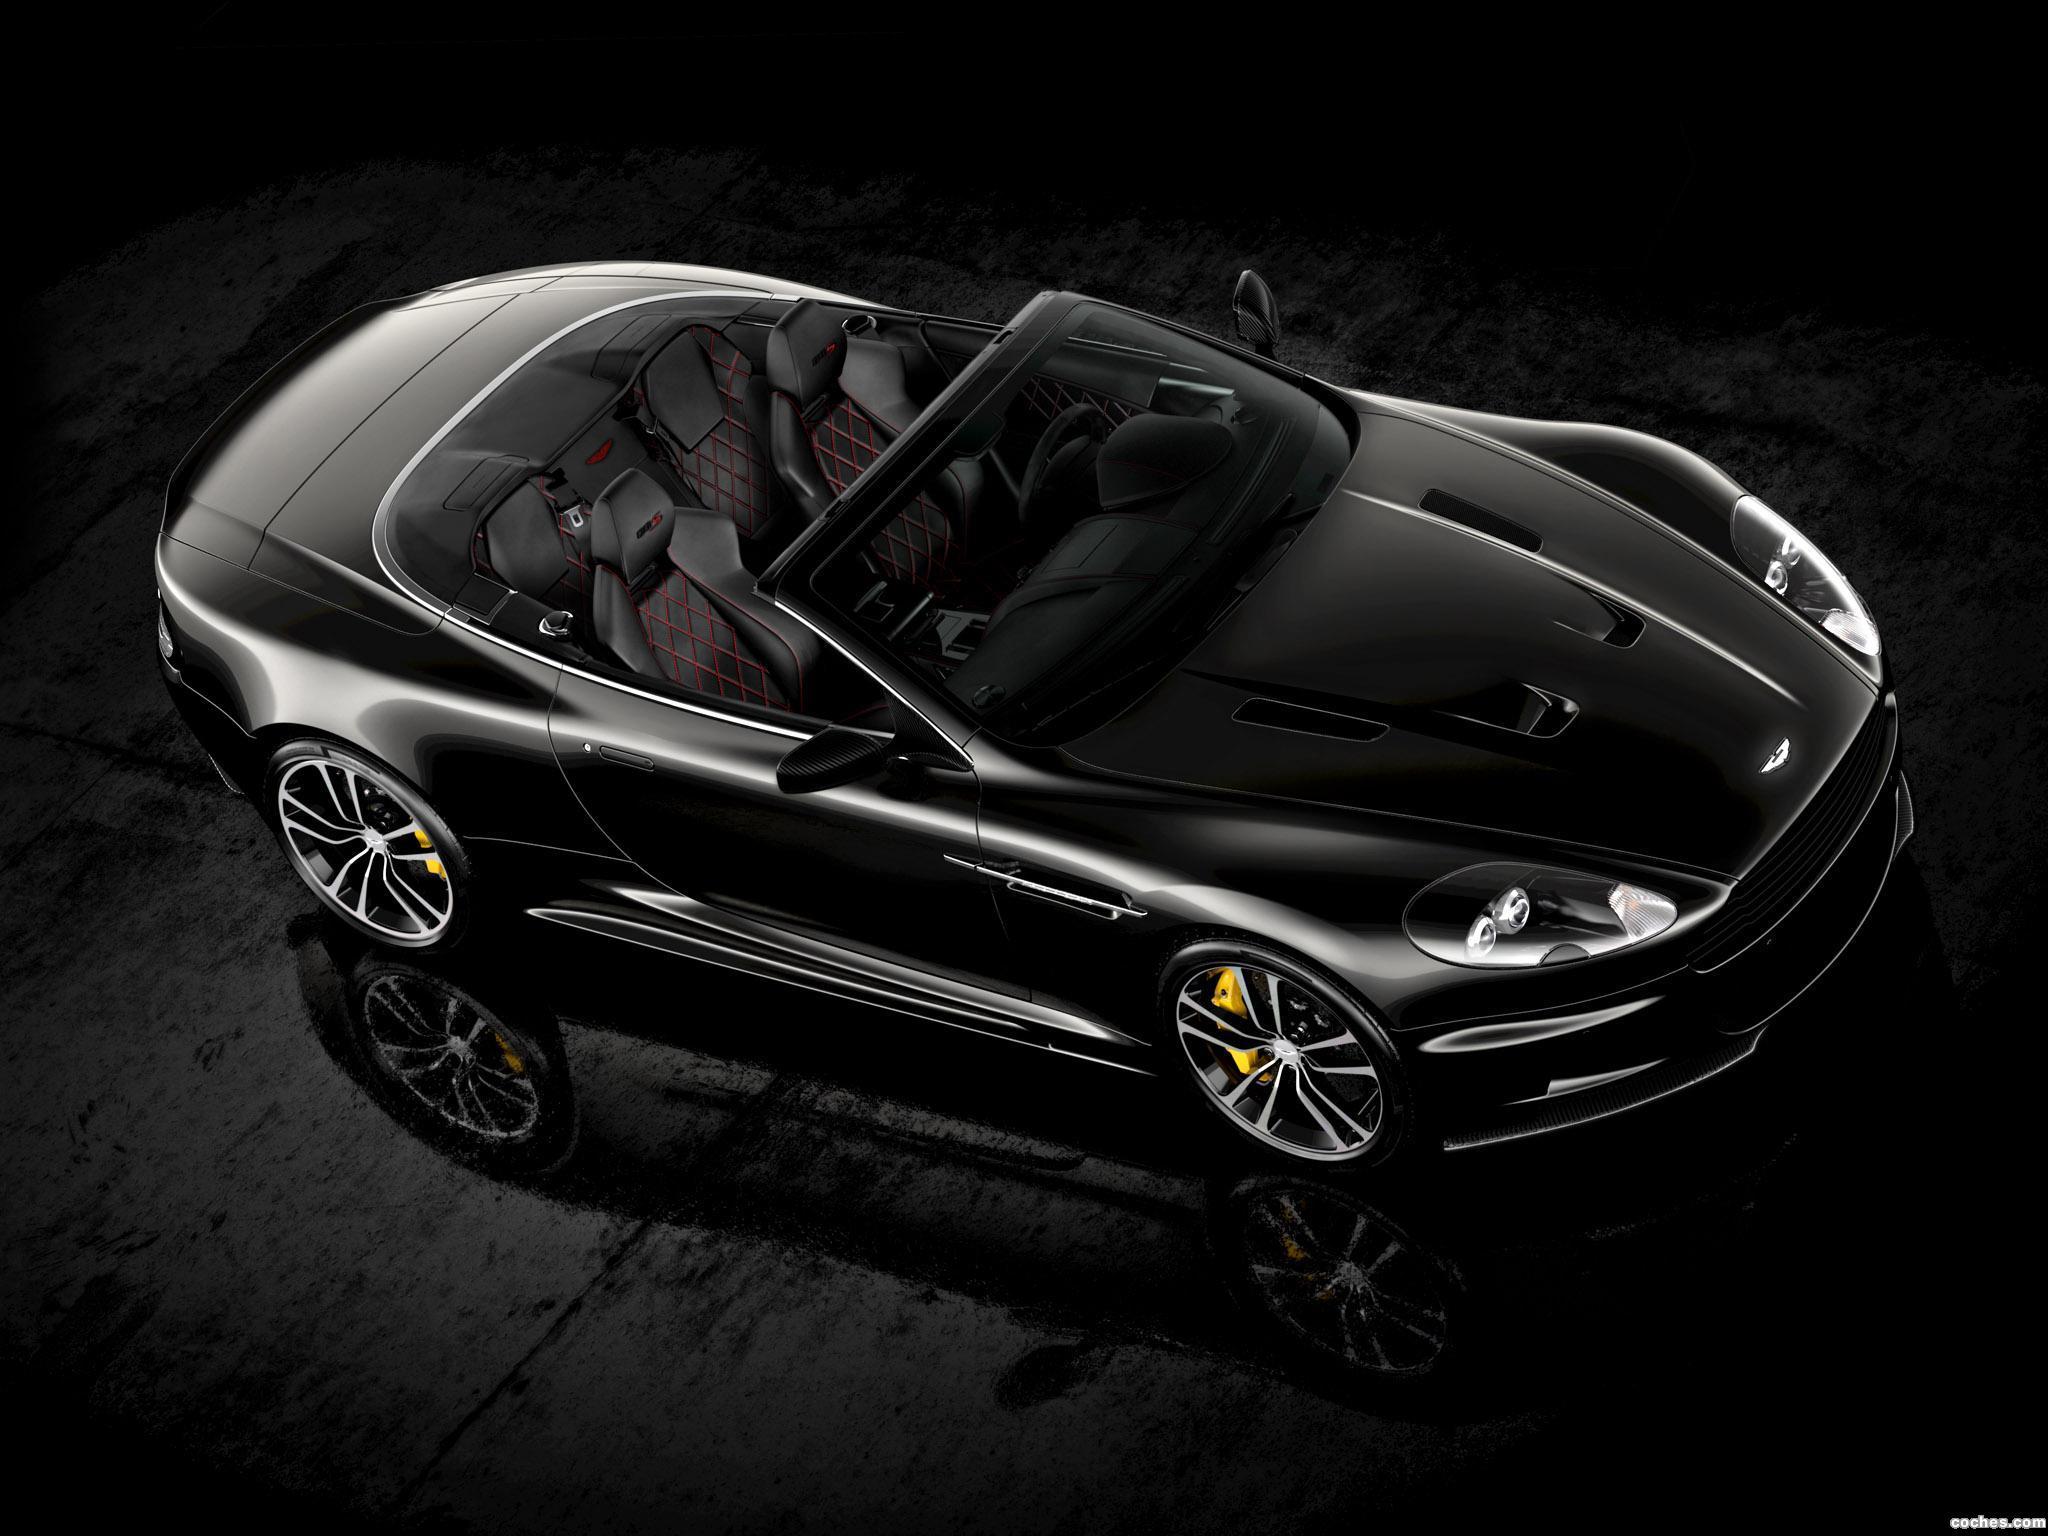 Foto 0 de Aston Martin DBS Volante Ultimate 2012